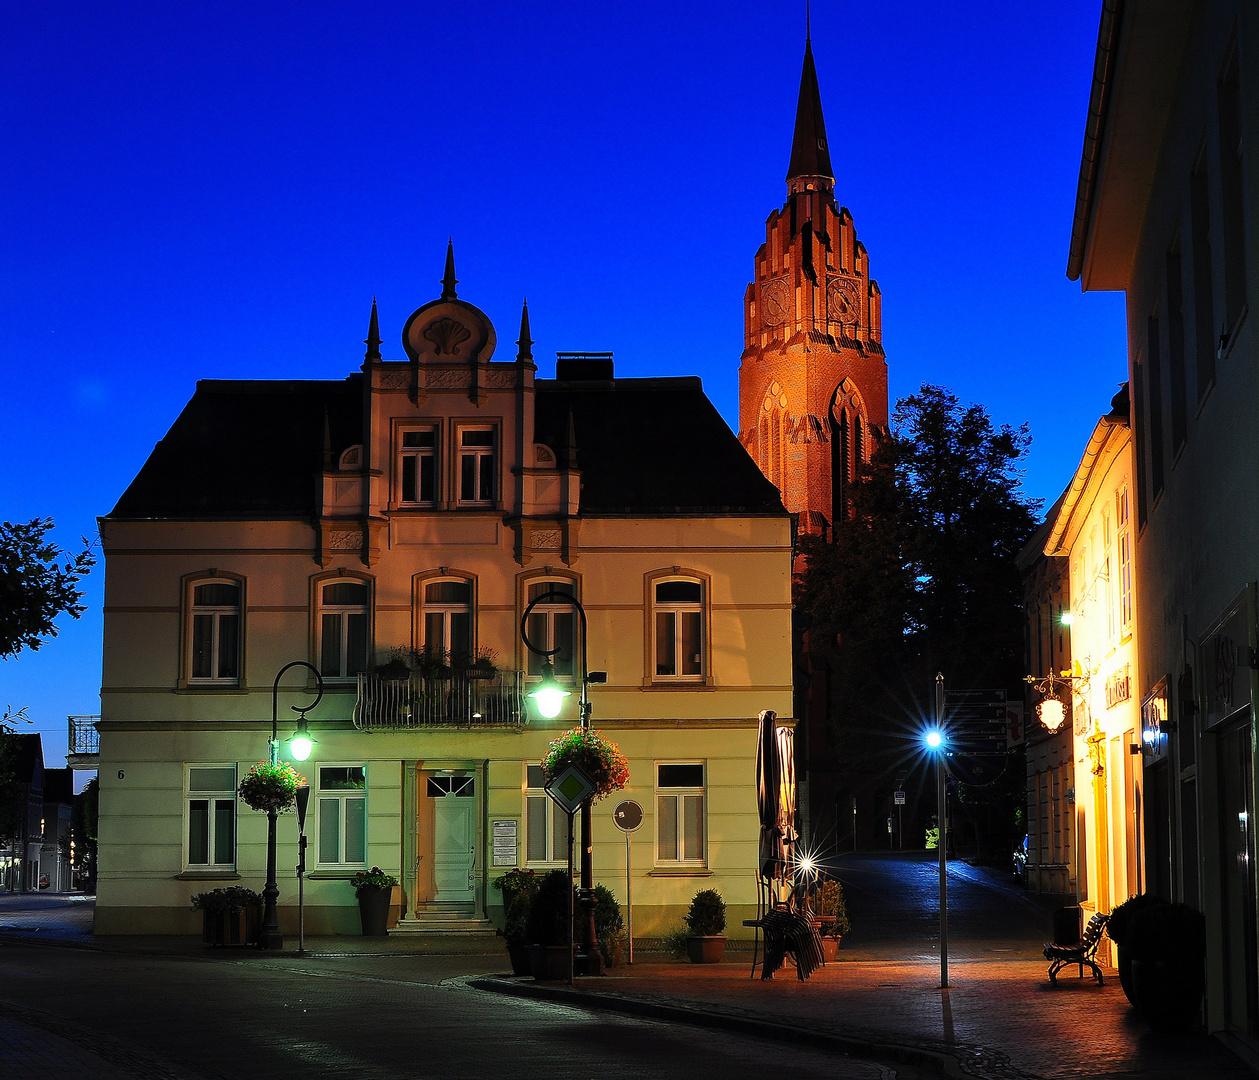 Jever - Altstadt zur blauen Stunde